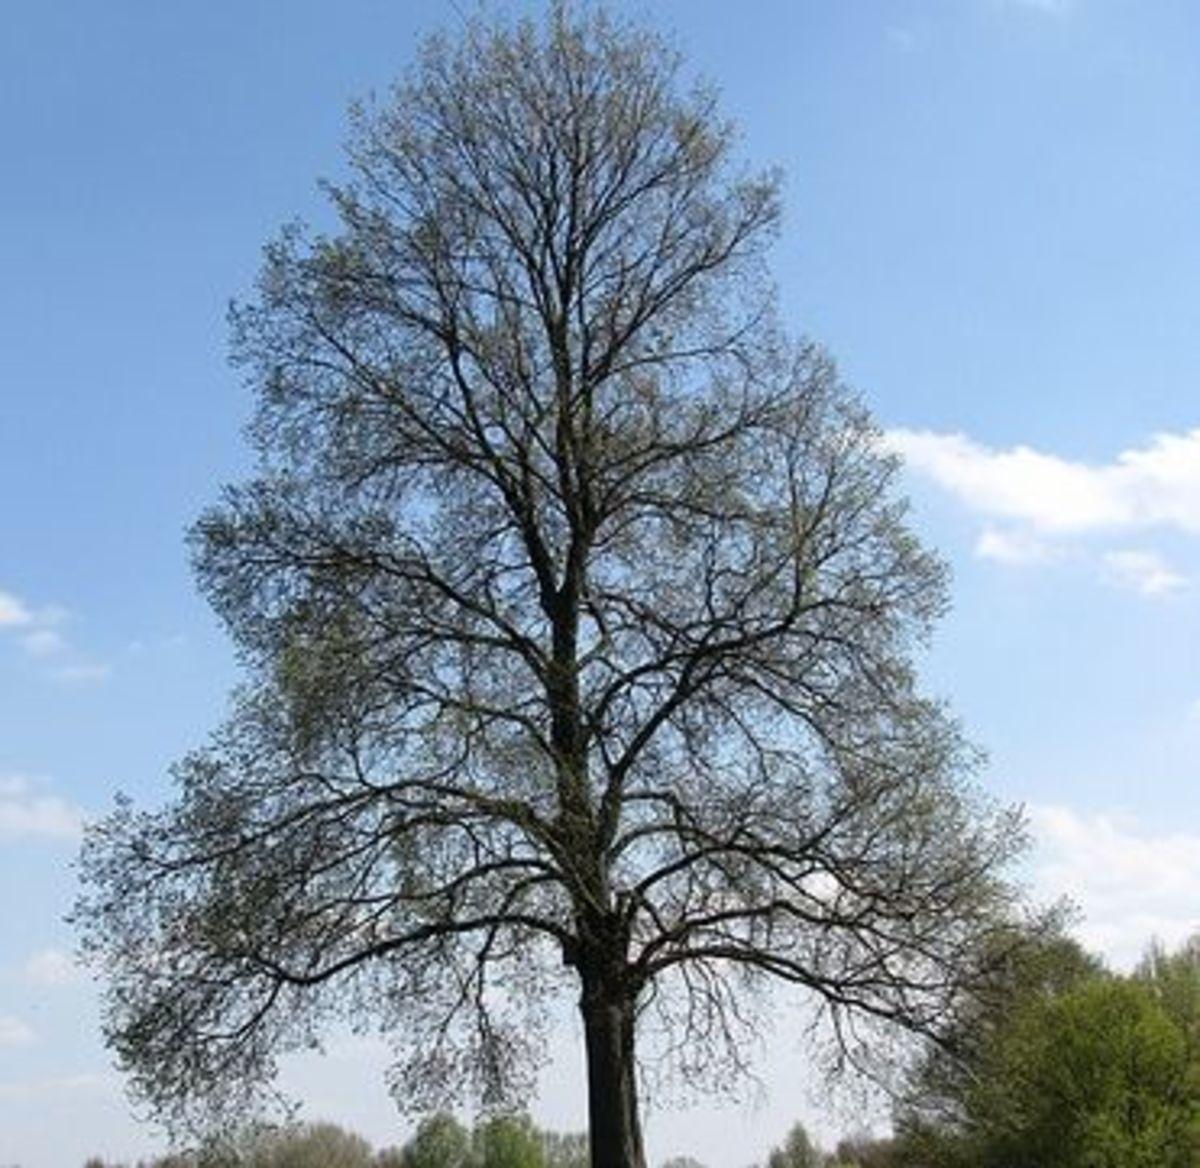 elm tree by liralina